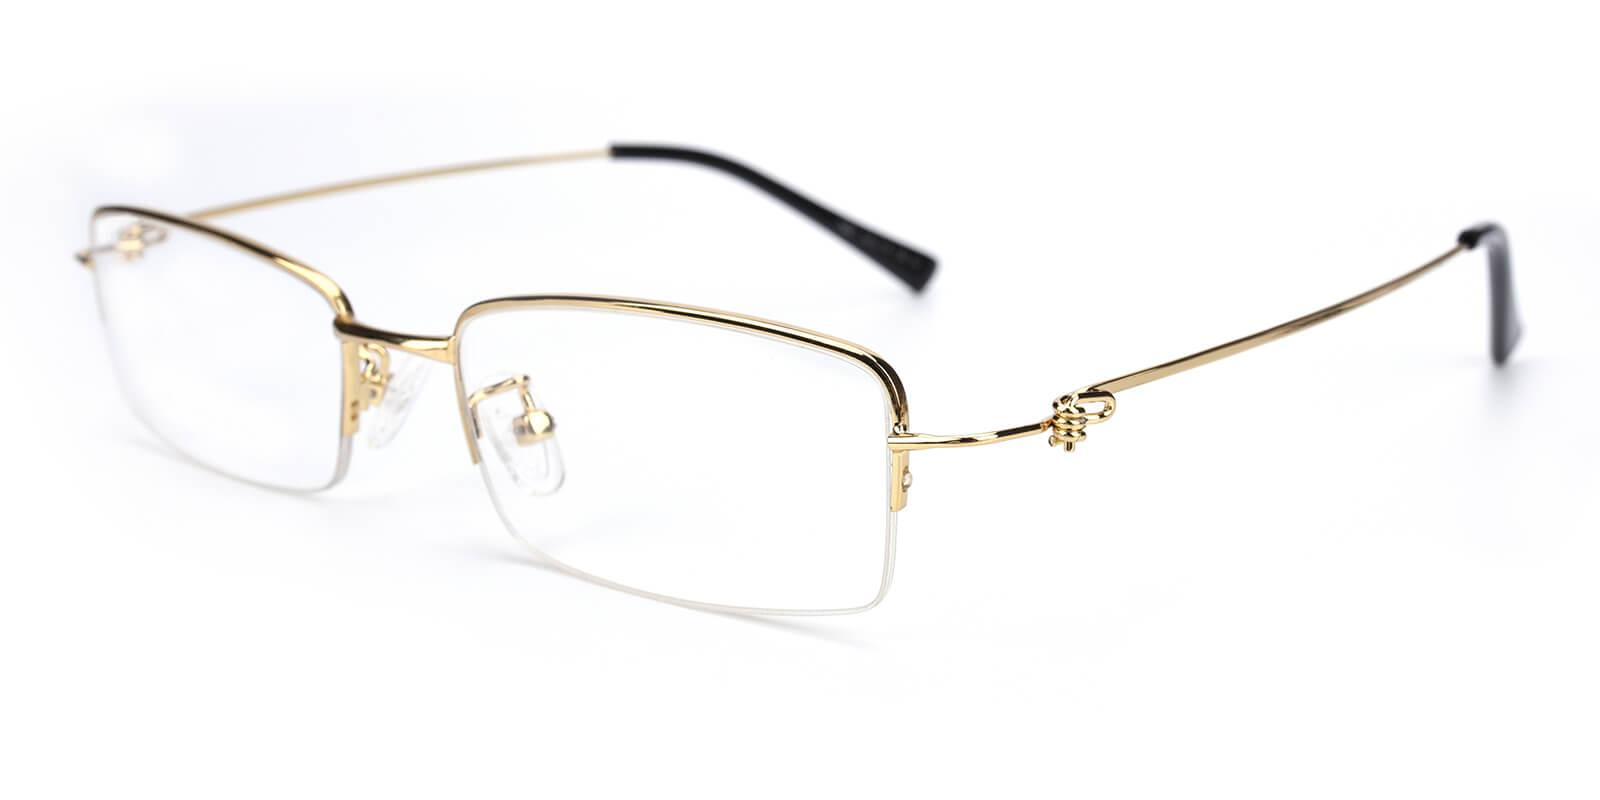 Rector-Gold-Rectangle-Metal-Eyeglasses-additional1